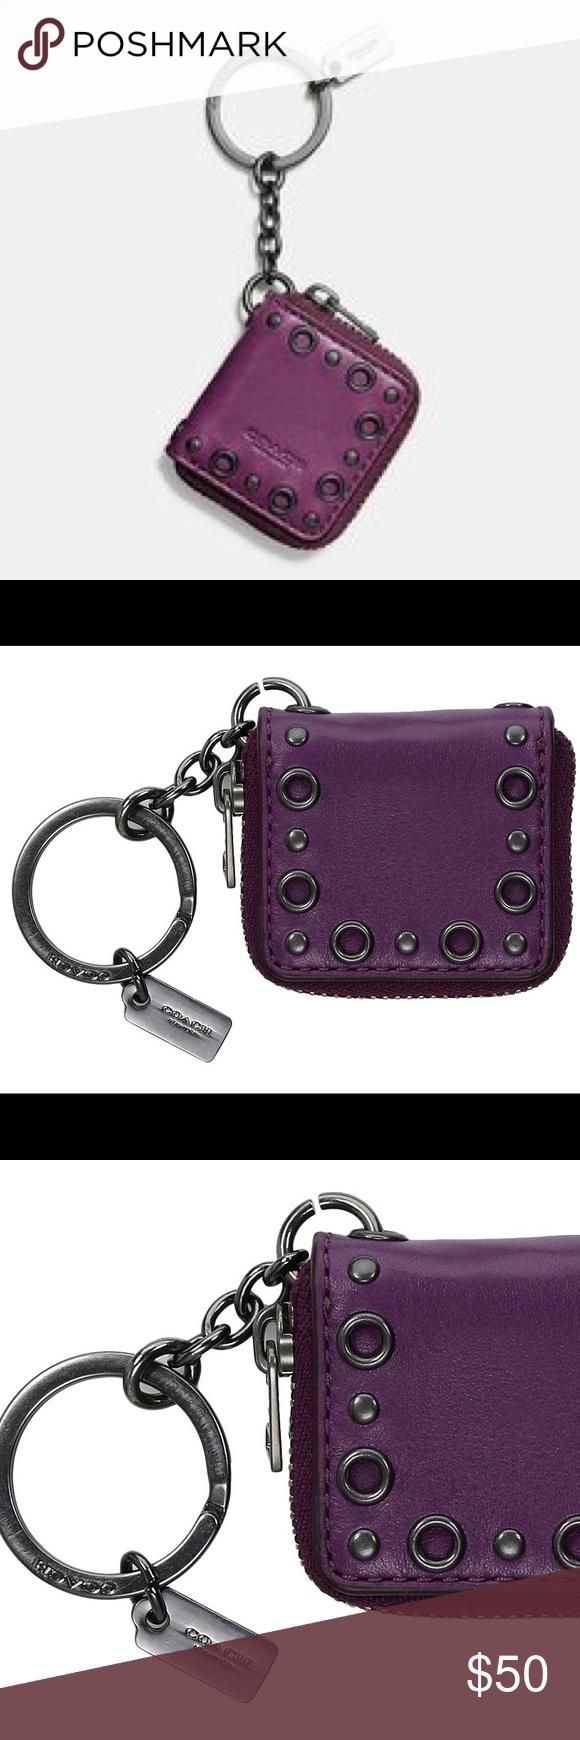 Coach purplish leather picture frame keychain ring key card coach purplish leather picture frame keychain ring jeuxipadfo Image collections